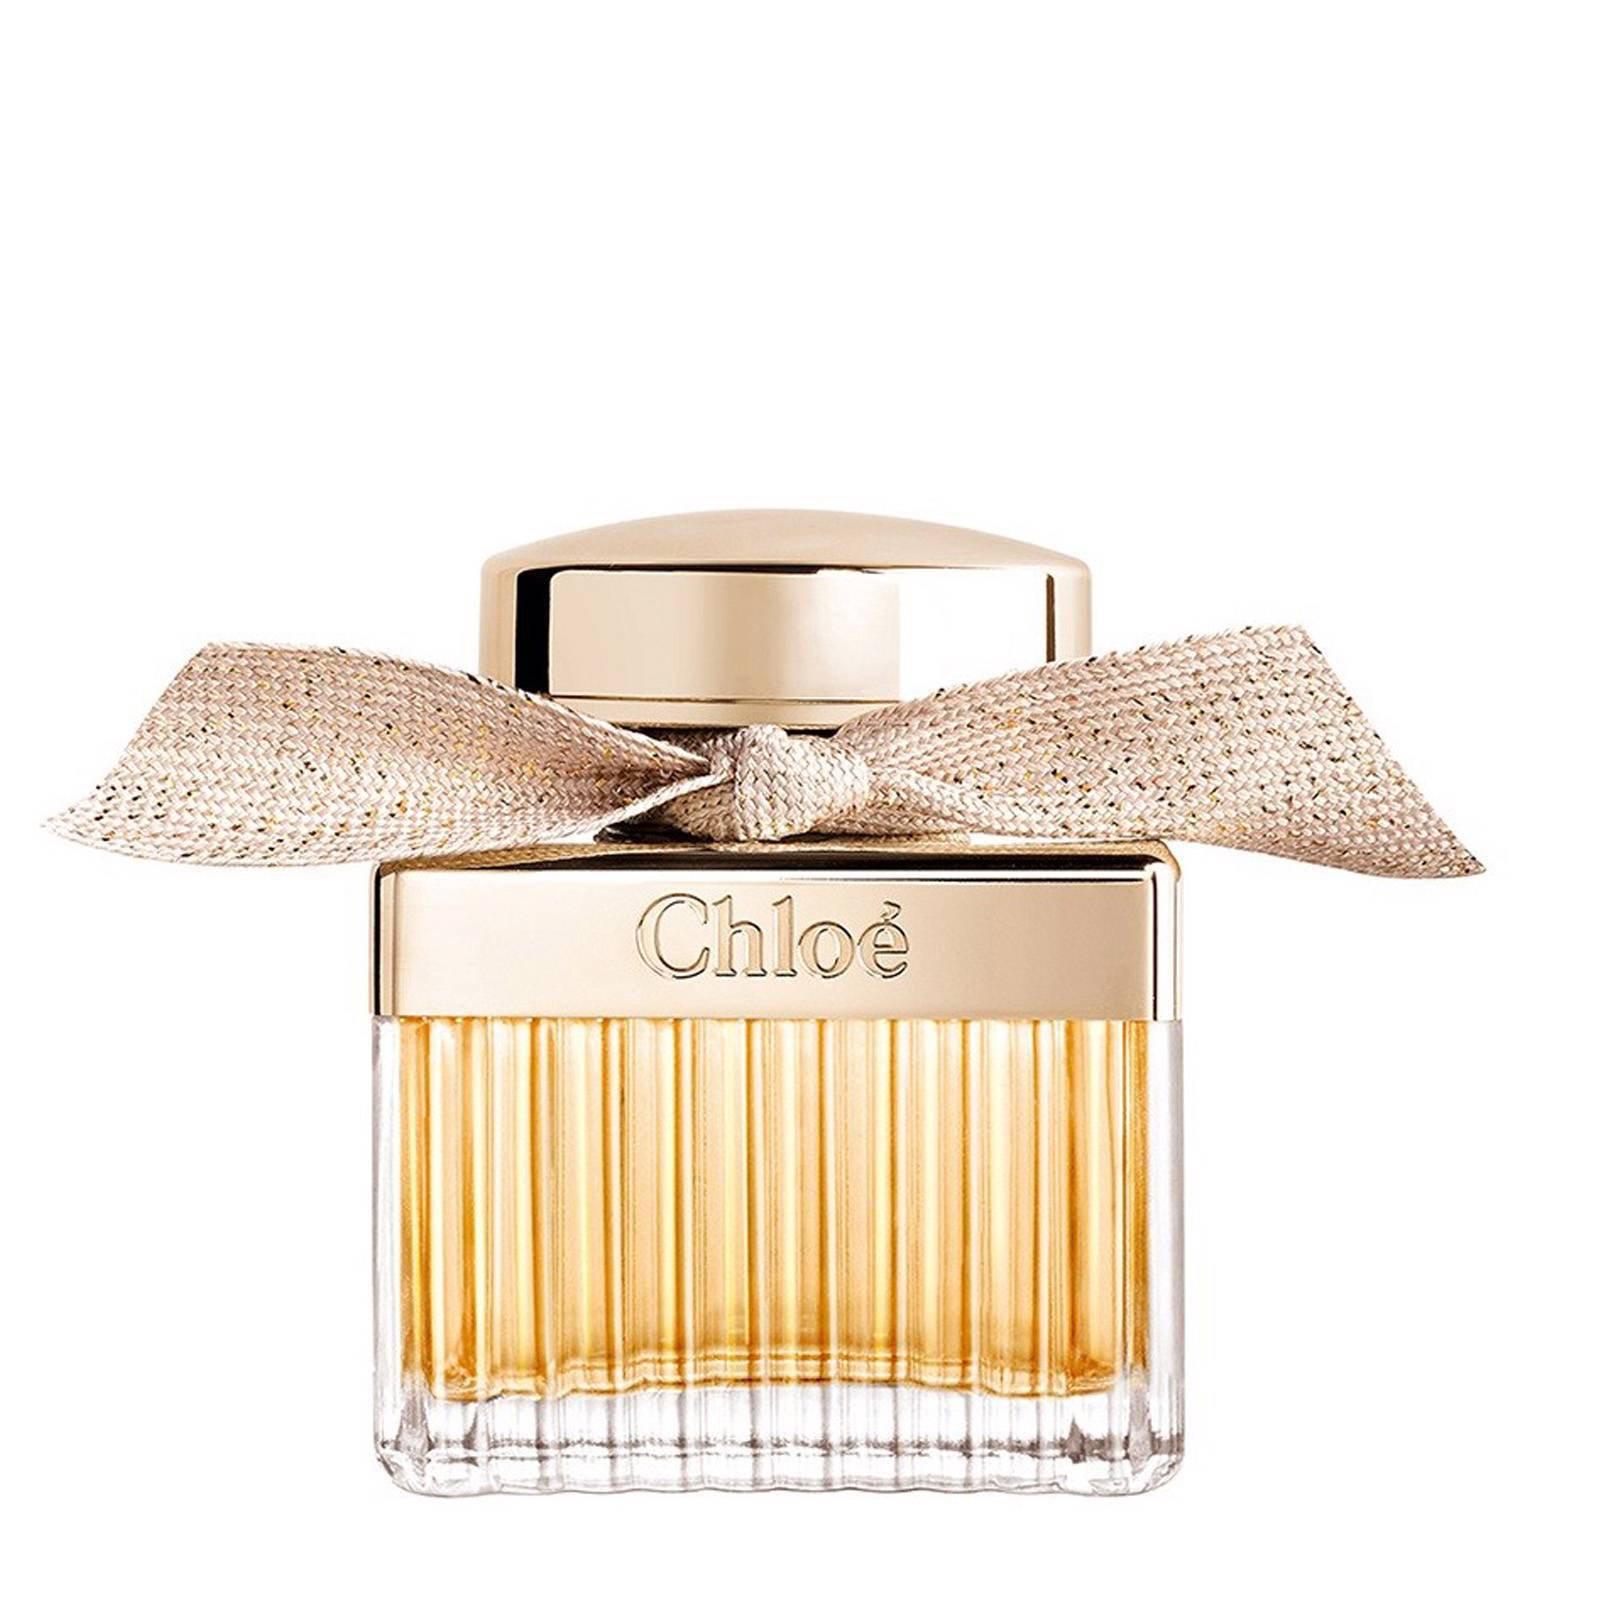 Chloe By Chloe eau de parfum 50 ml | wehkamp